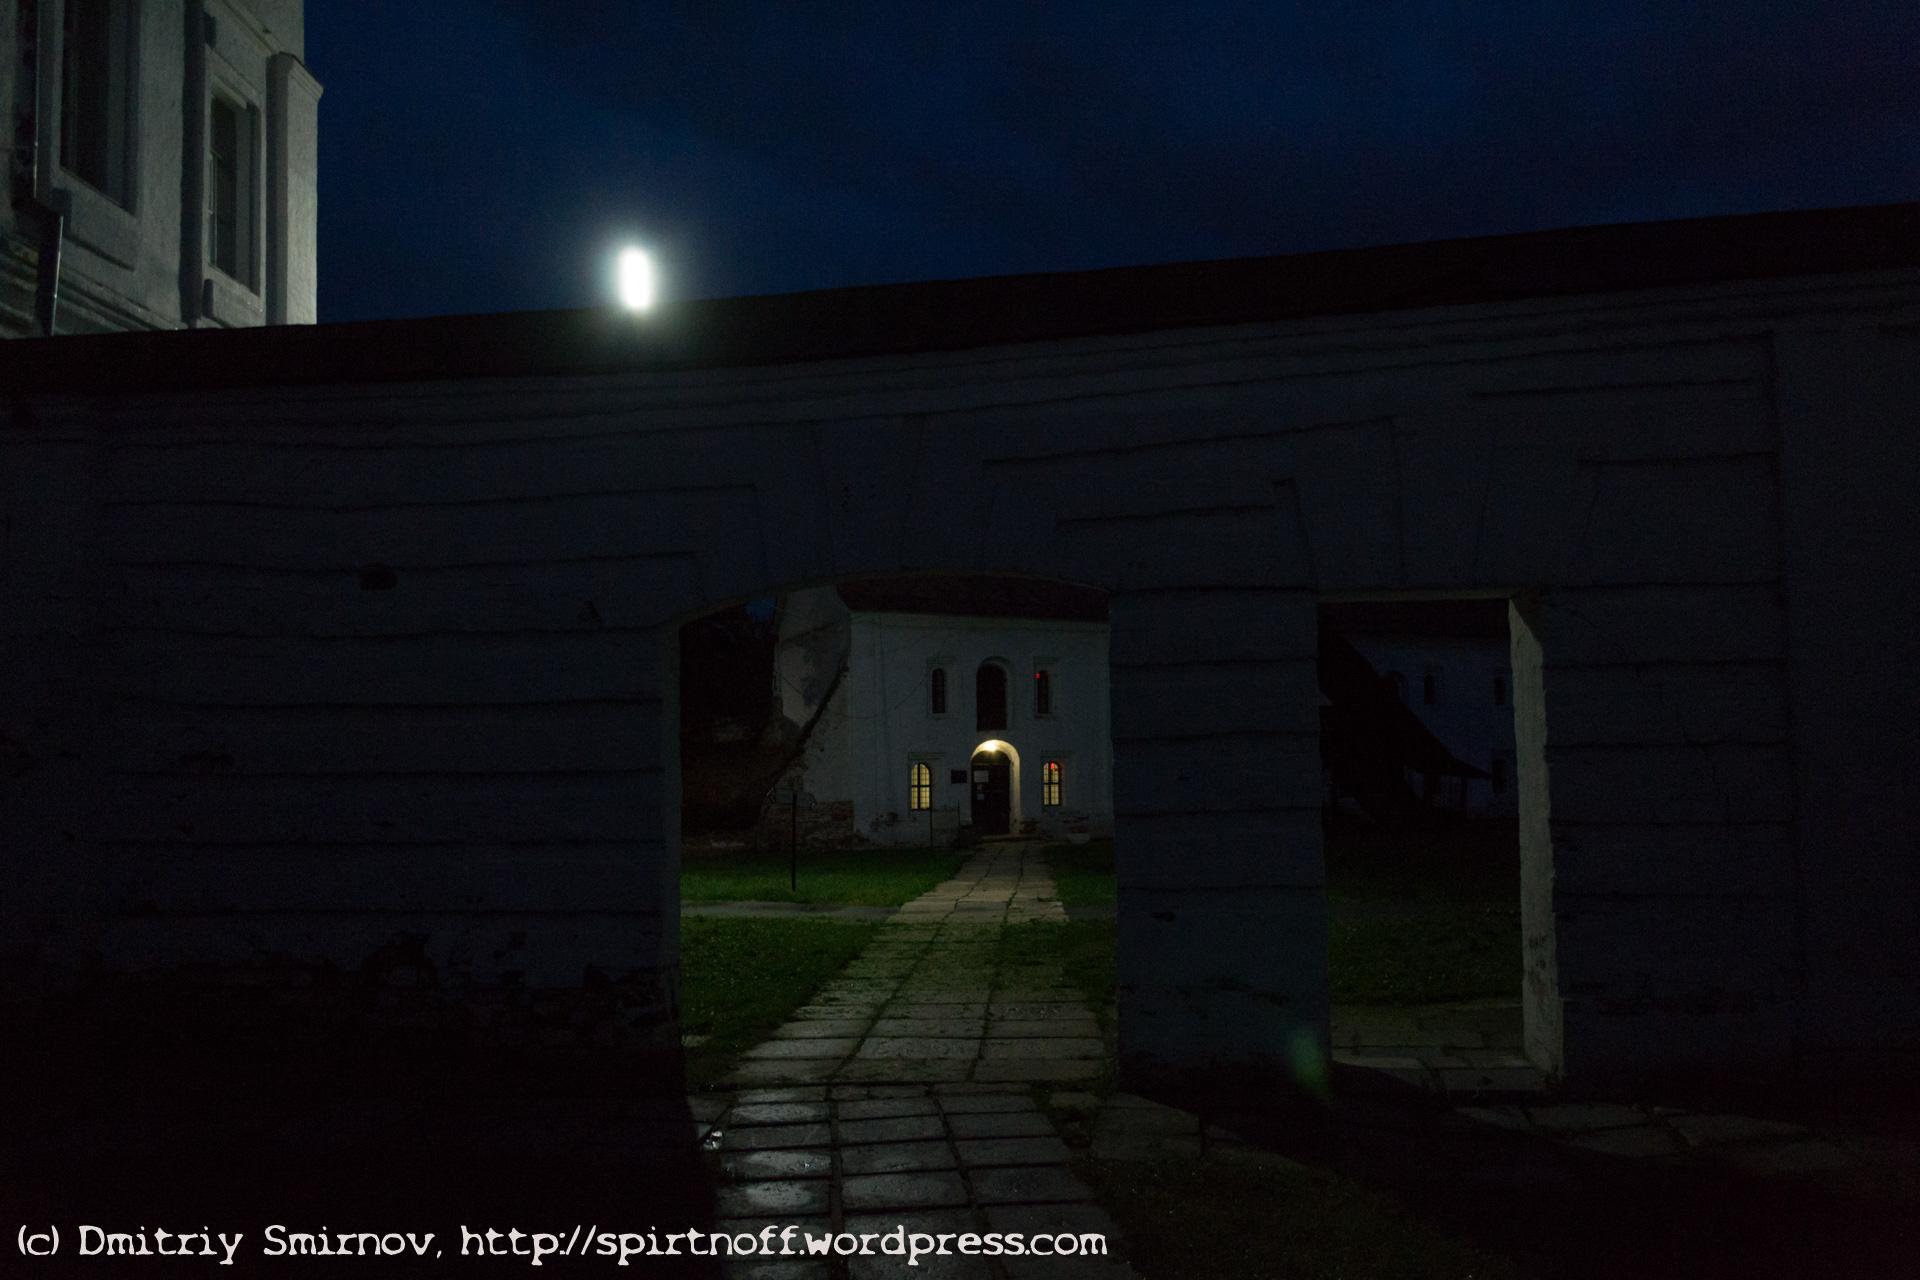 blog-23-of-59 Путешествия  Рязань. Город темных фонарей